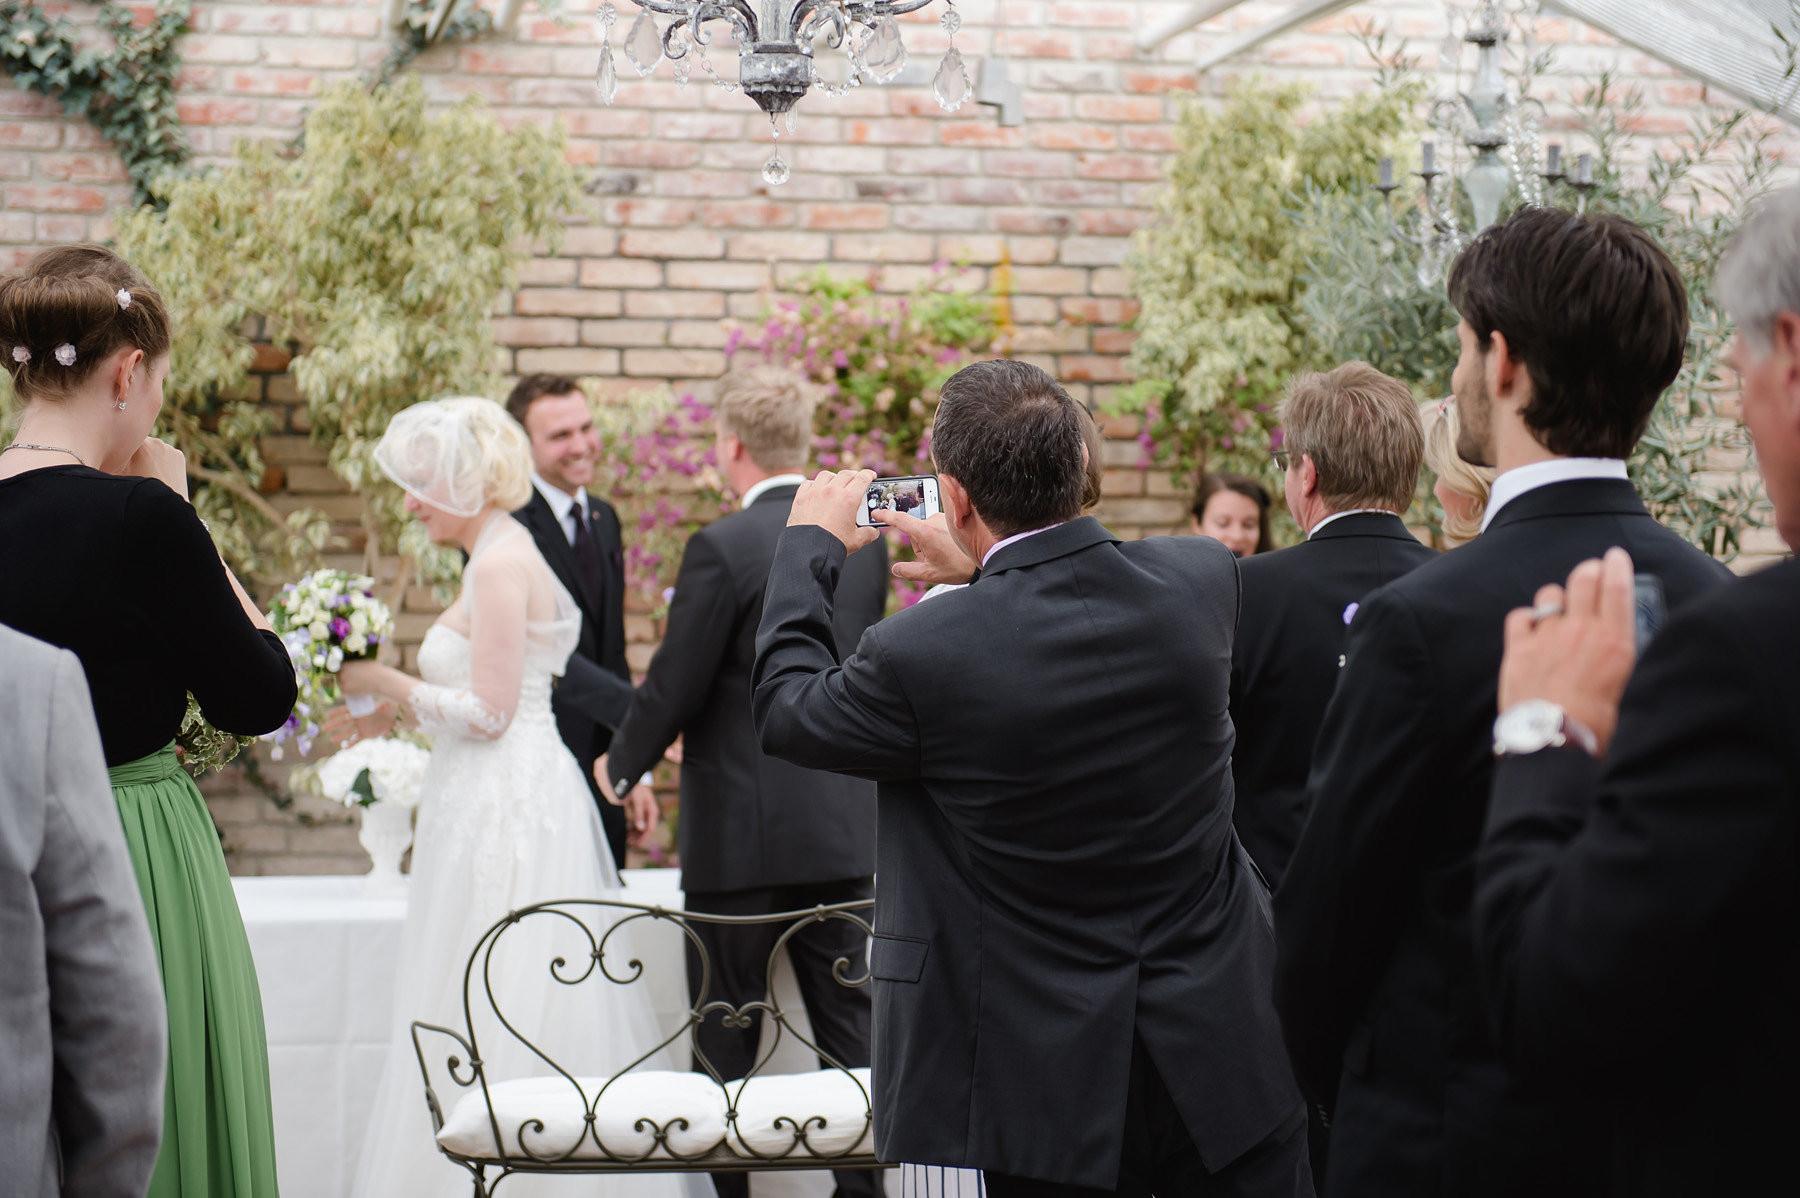 Hochzeit Carry & Andi / Photos by Jelena Moro Fotografie